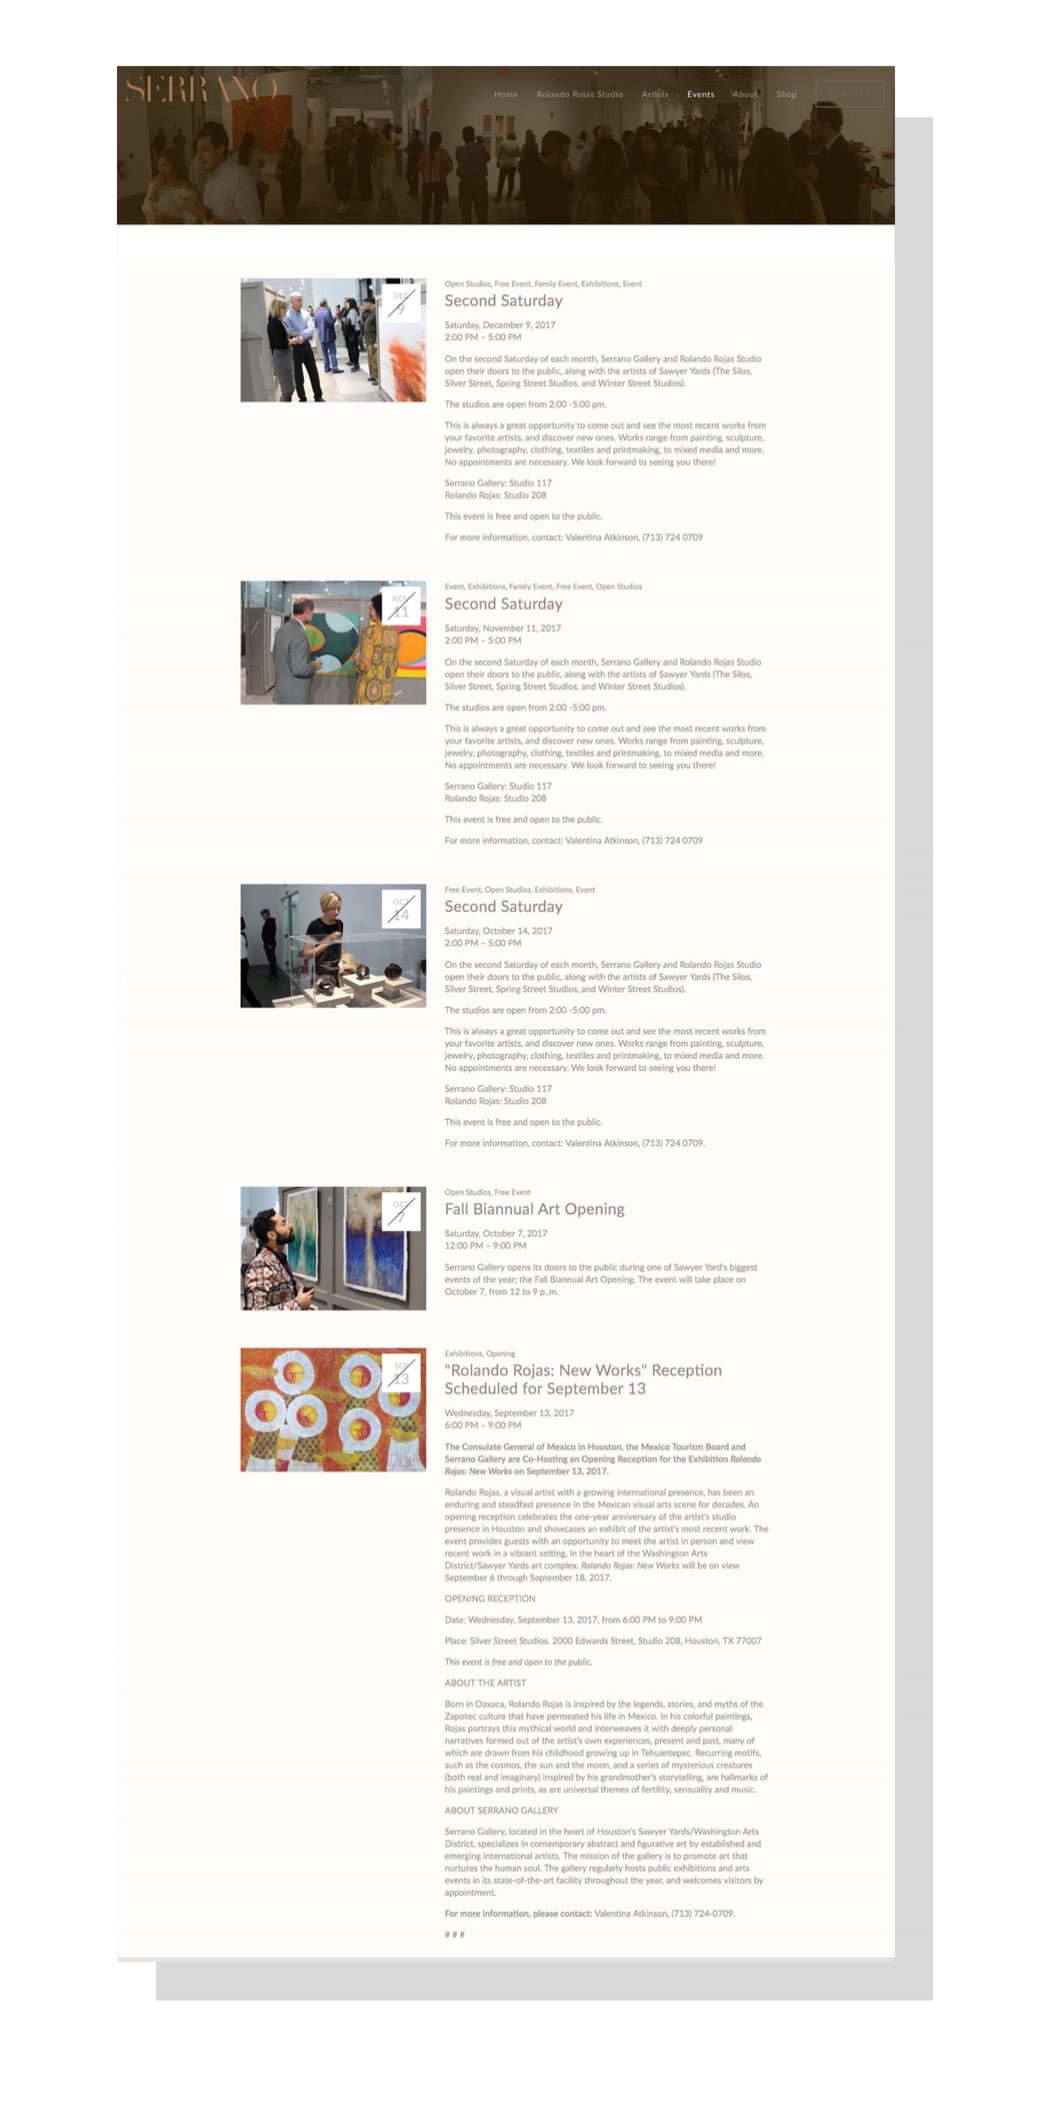 Serrano-Gallery-Calendar-Events.png